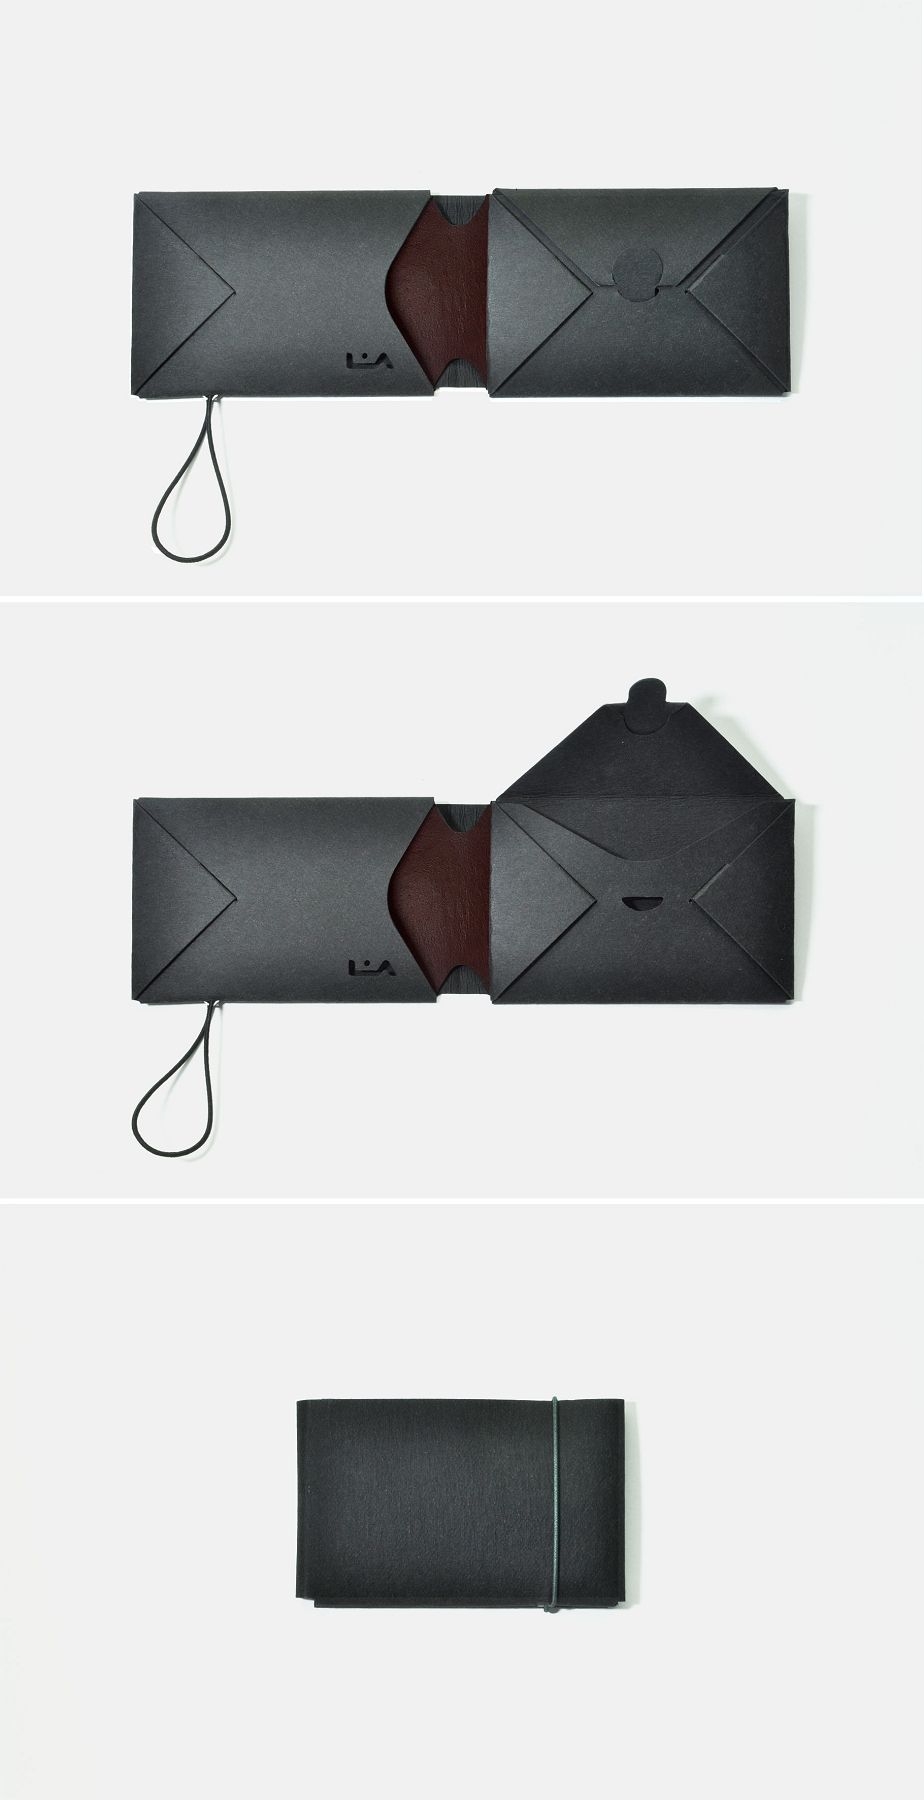 85d560aa37 liaform, portafogli origami nero / marrone rossiccio, portafoglio mini vegan  (borsa, portamonete